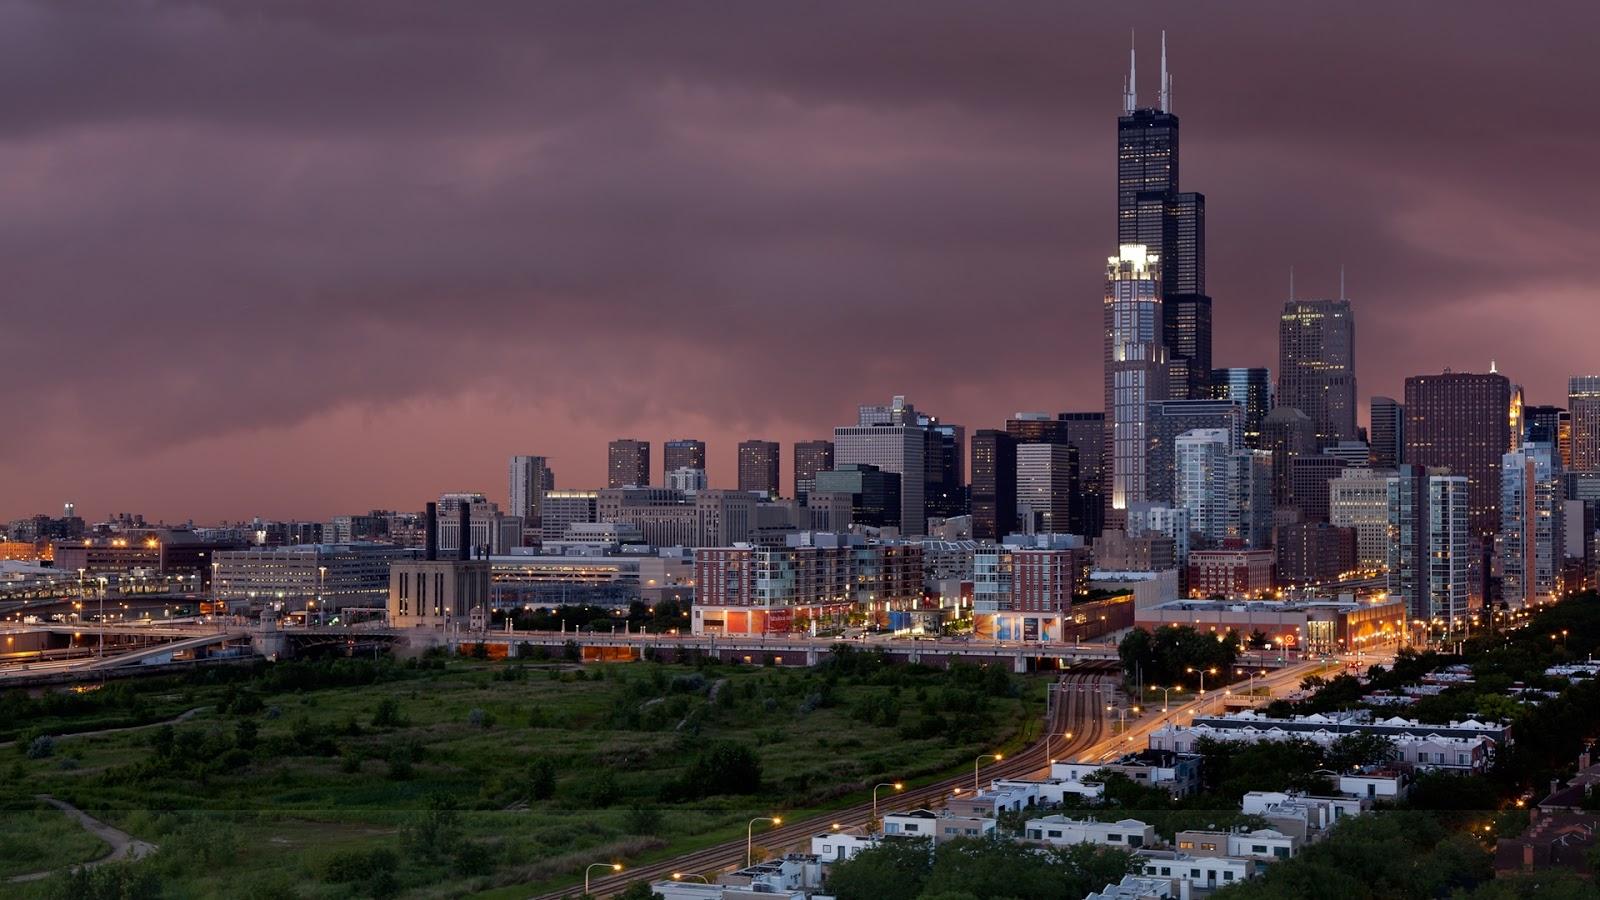 Chicago Lights at Night